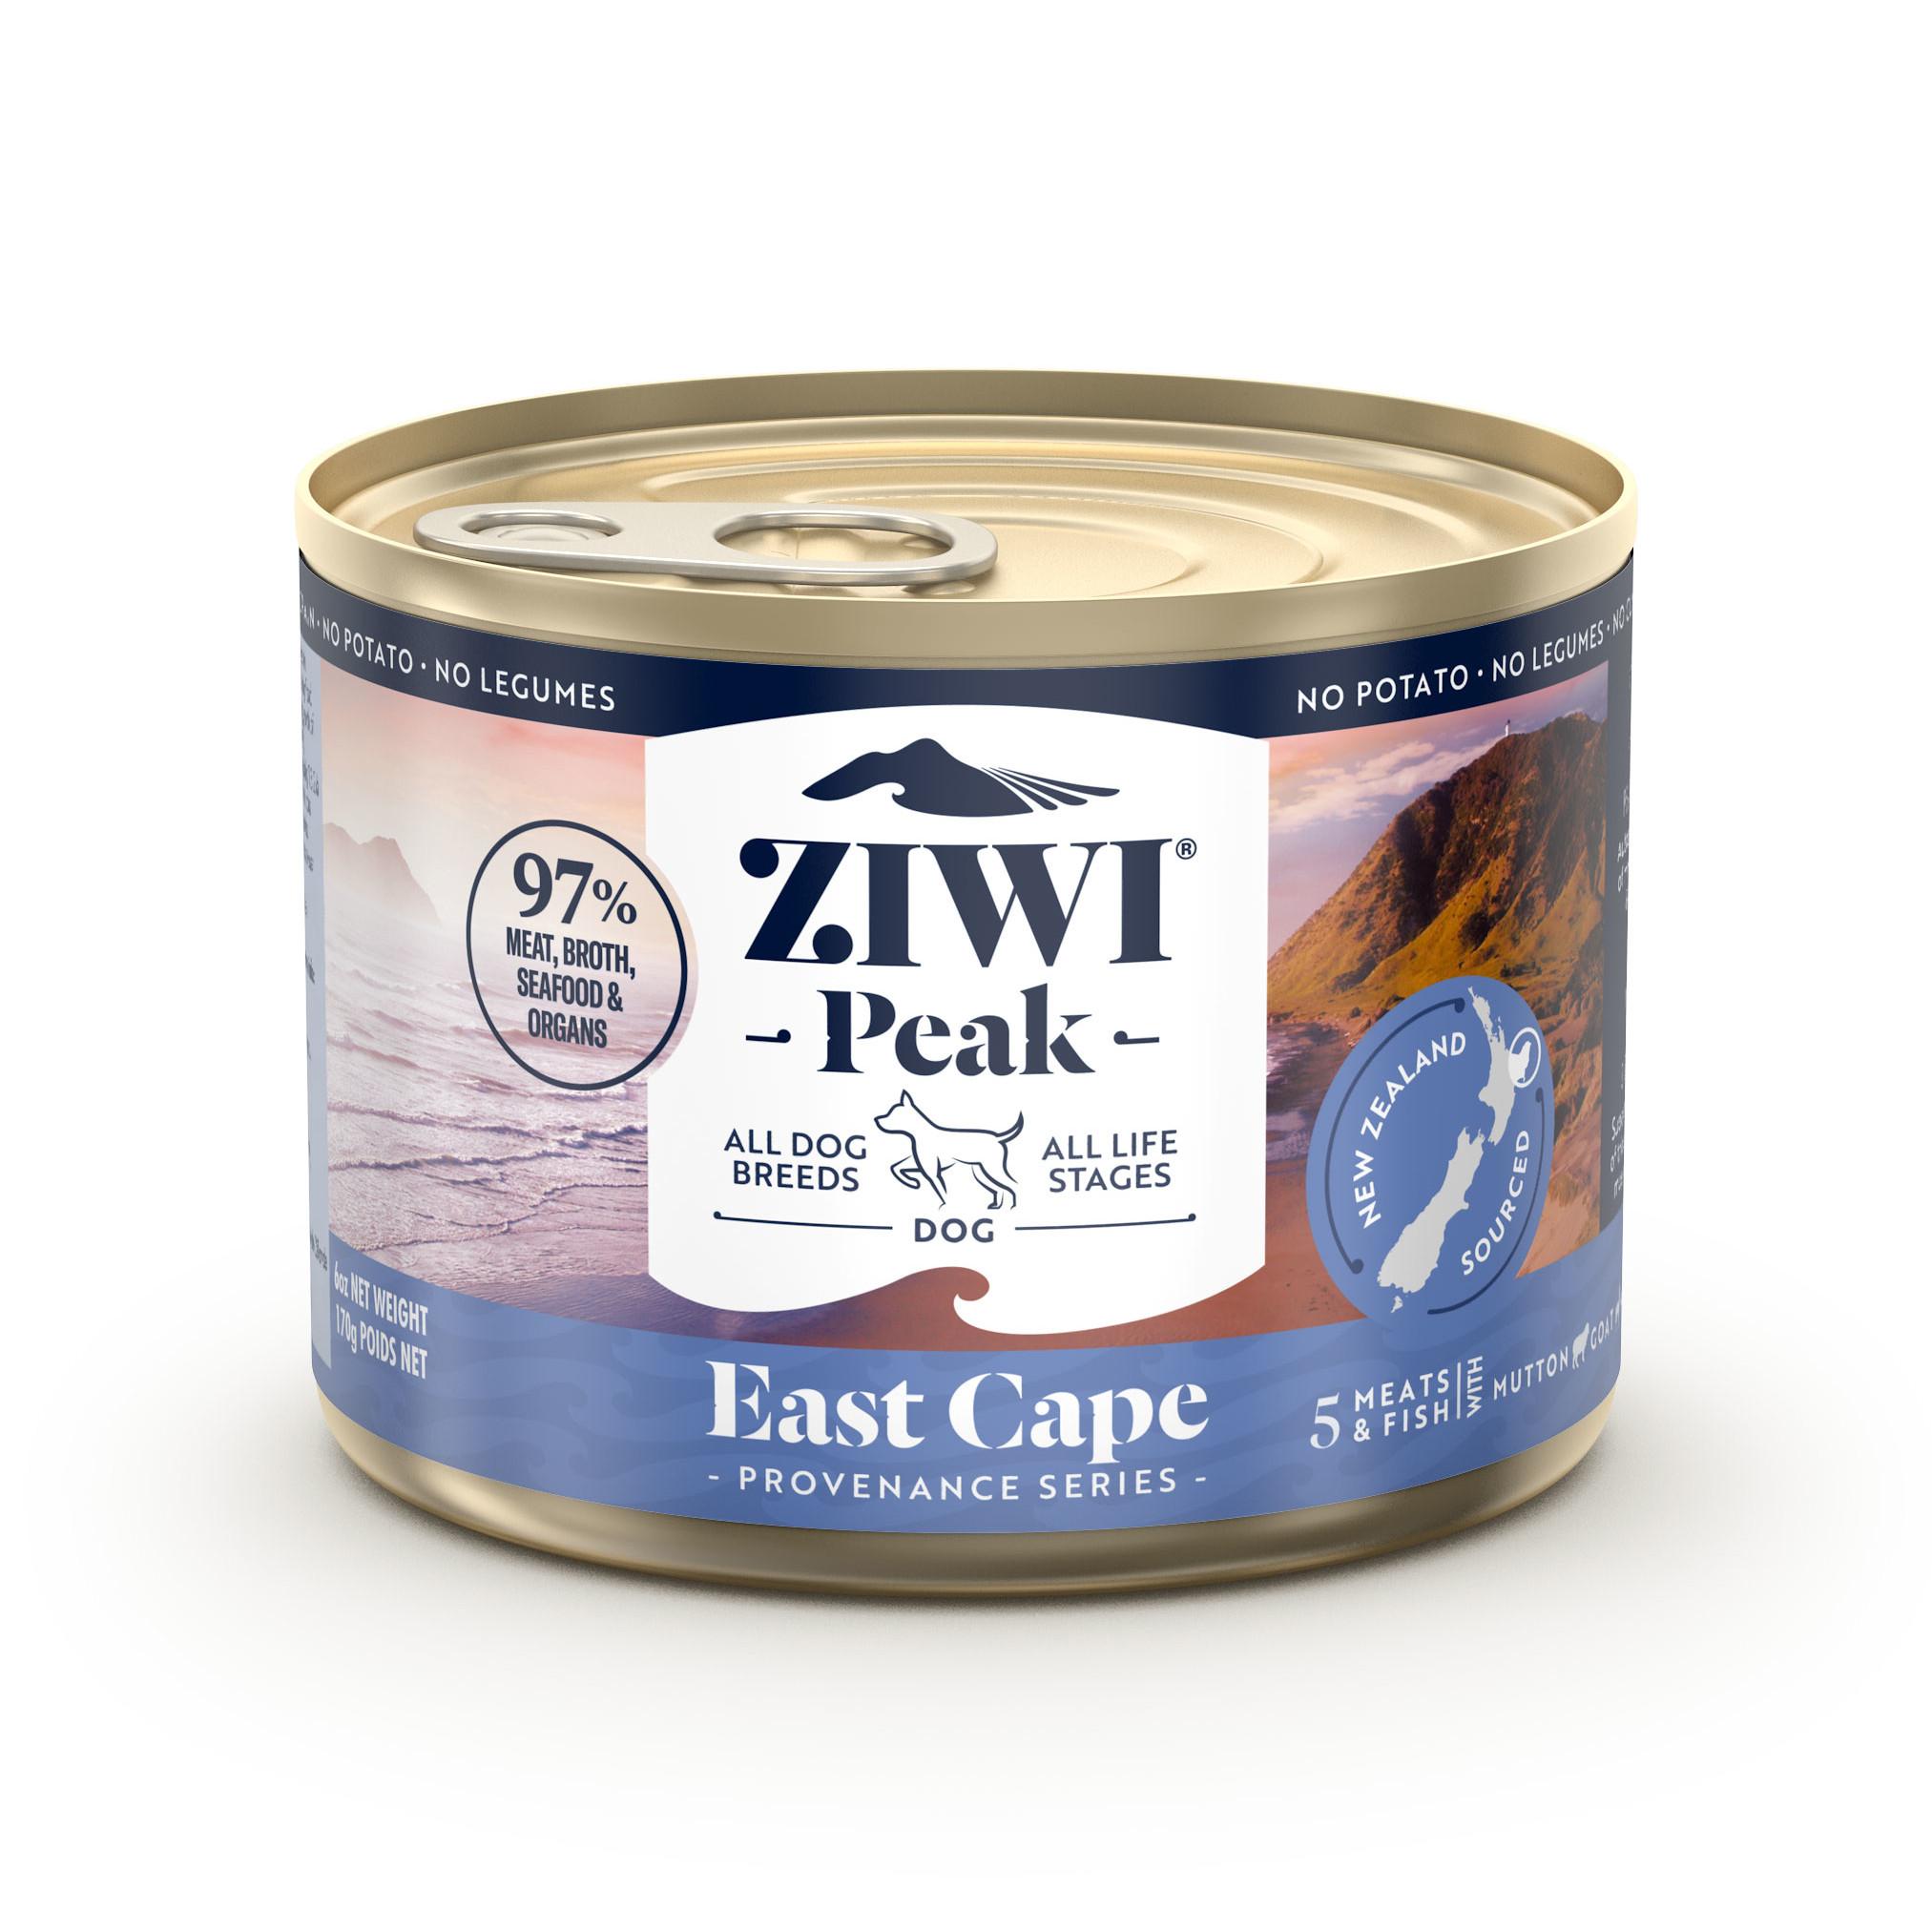 ZIWI Peak Provenance Canned Dog Food East Cape Recipe, 6-oz 170-g